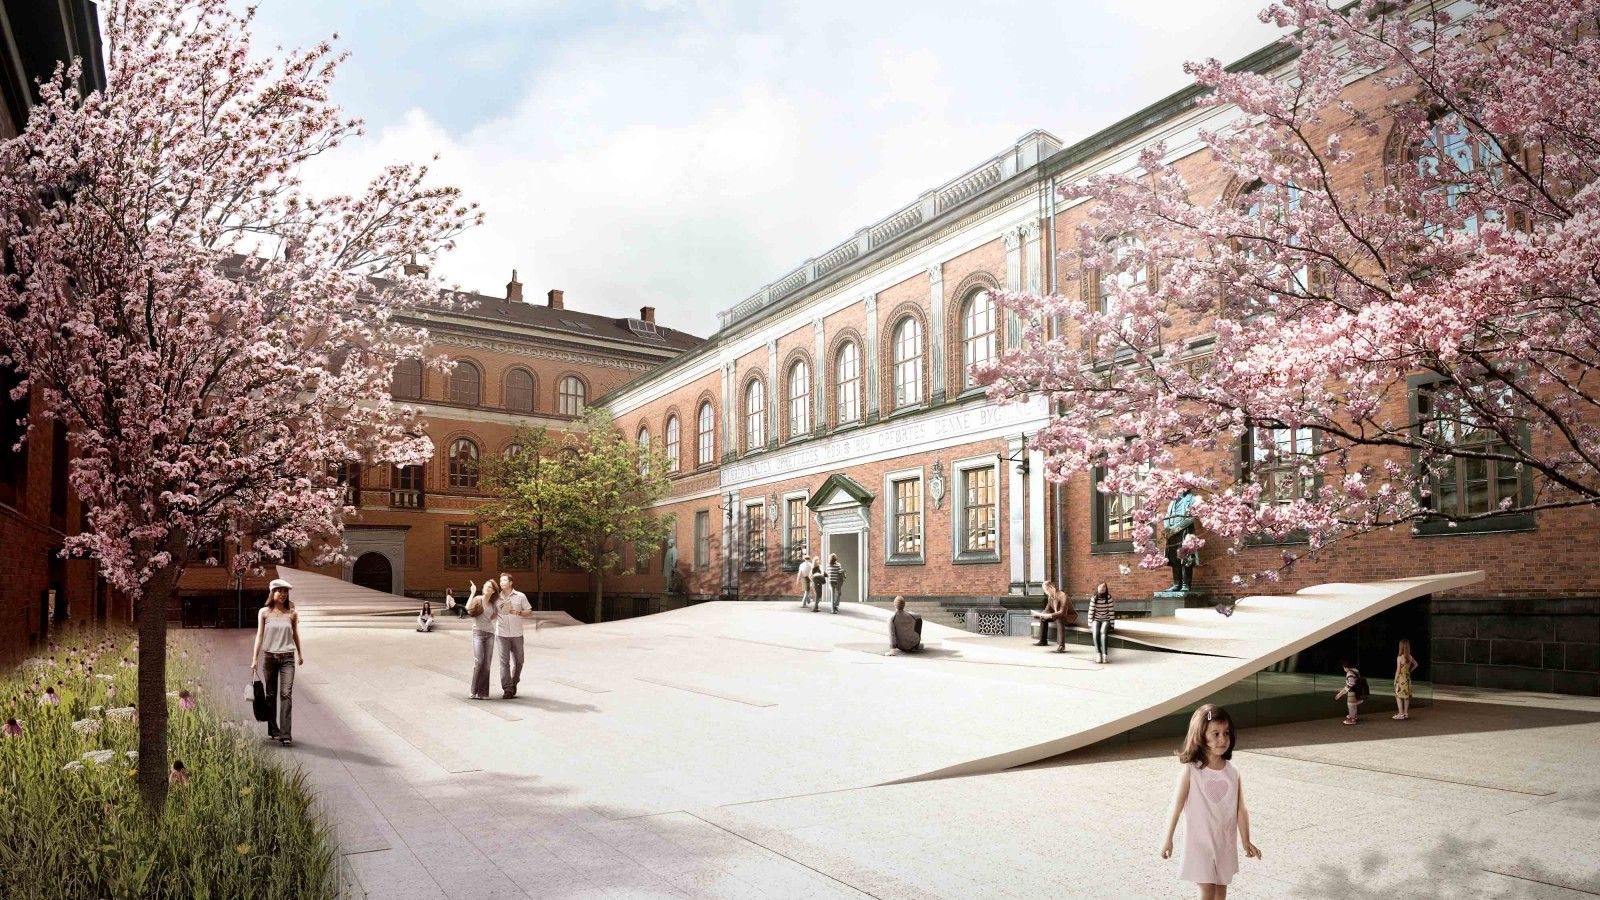 New Wing, National History Museum | Kengo Kuma, Erik Møller Arkitekter, JAJA architects - Arch2O.com